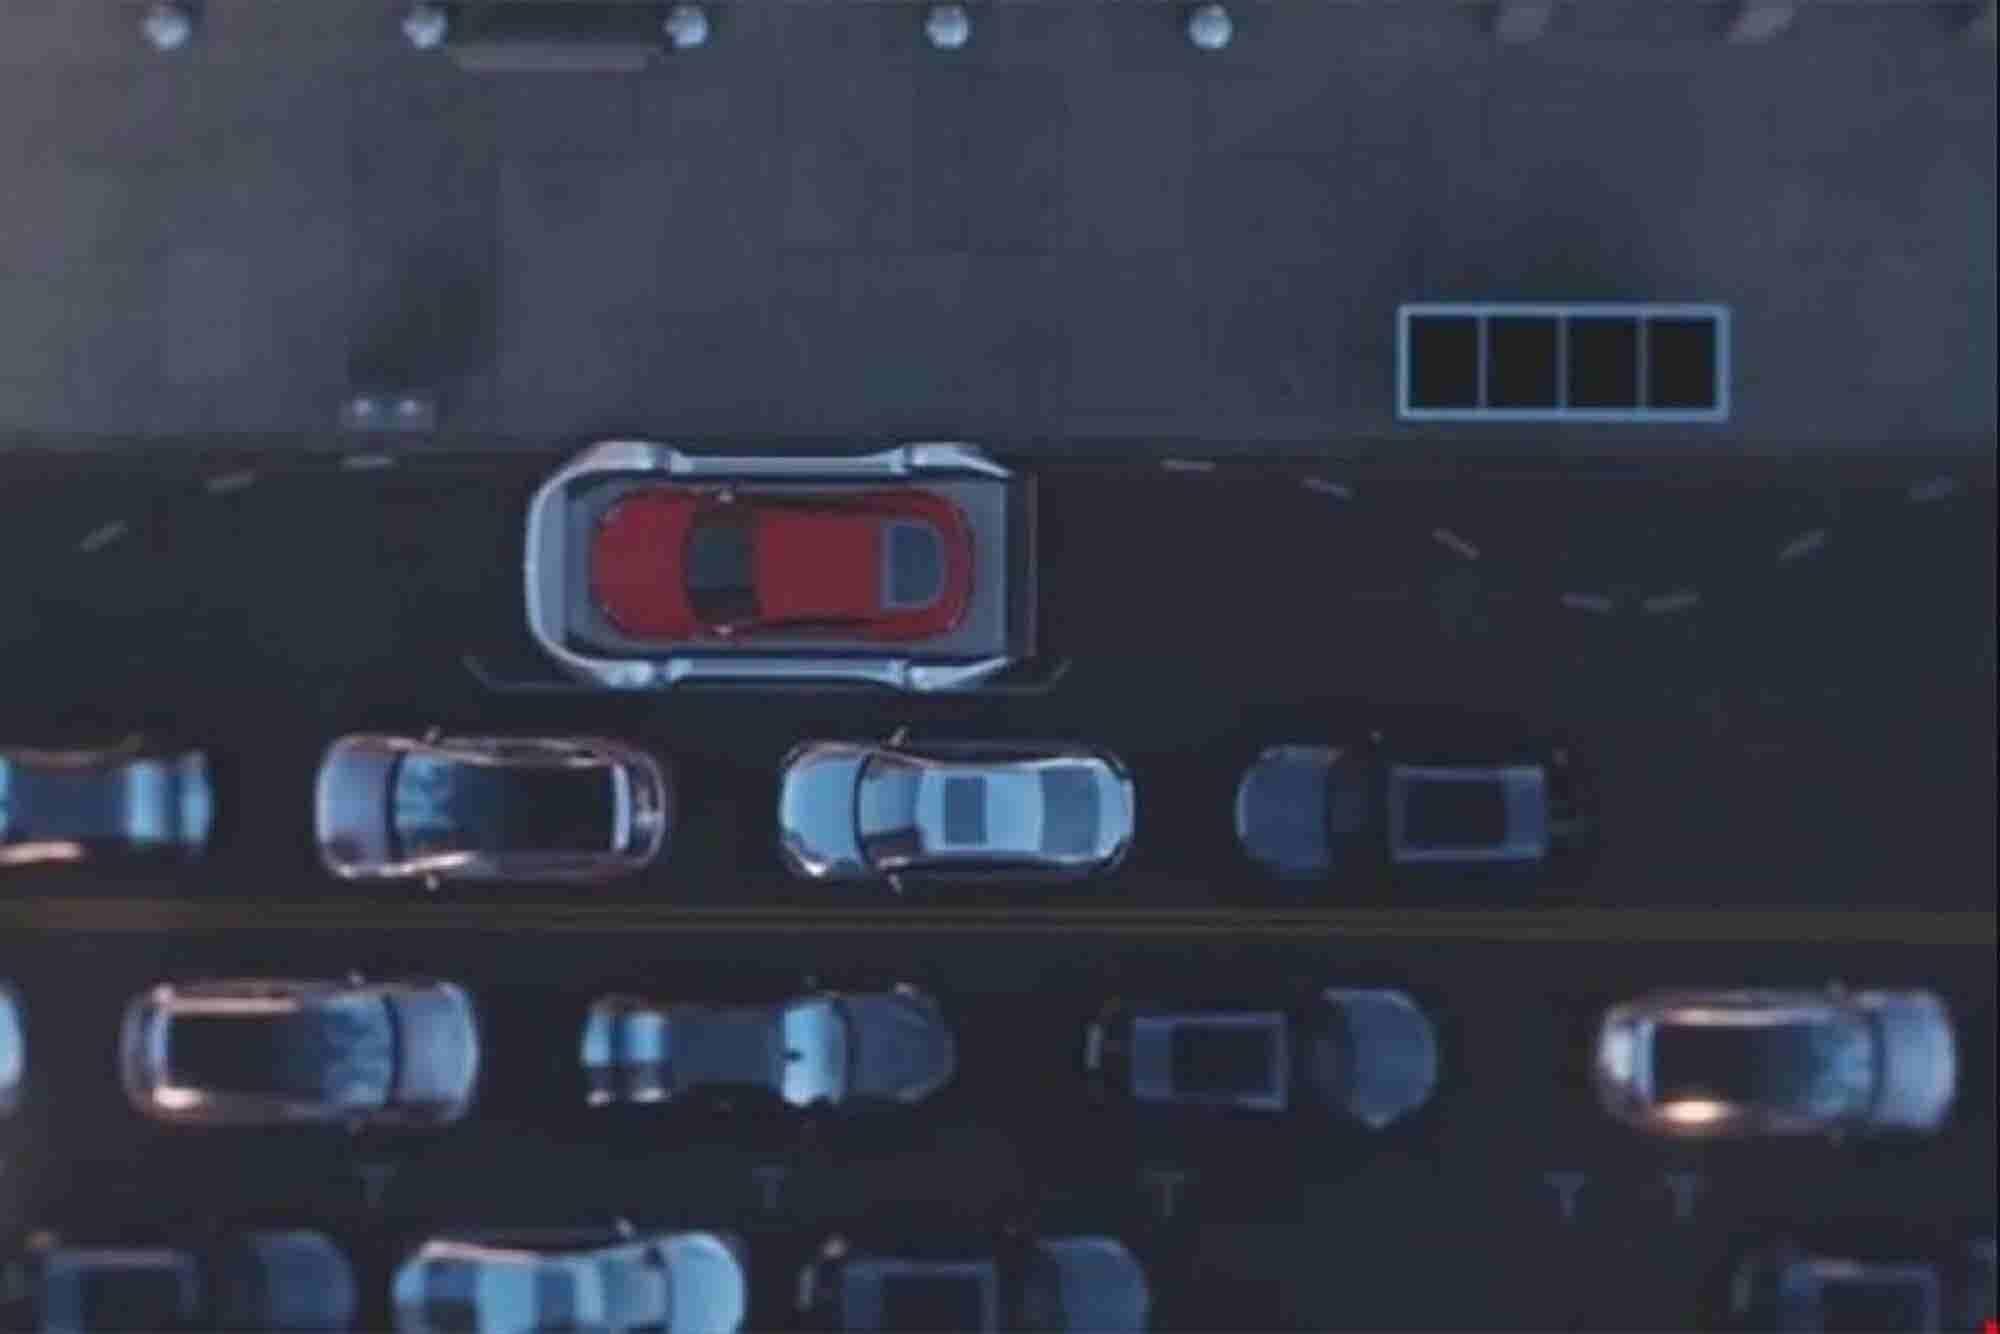 Elon Musk Shows Off The Boring Company Car Elevator